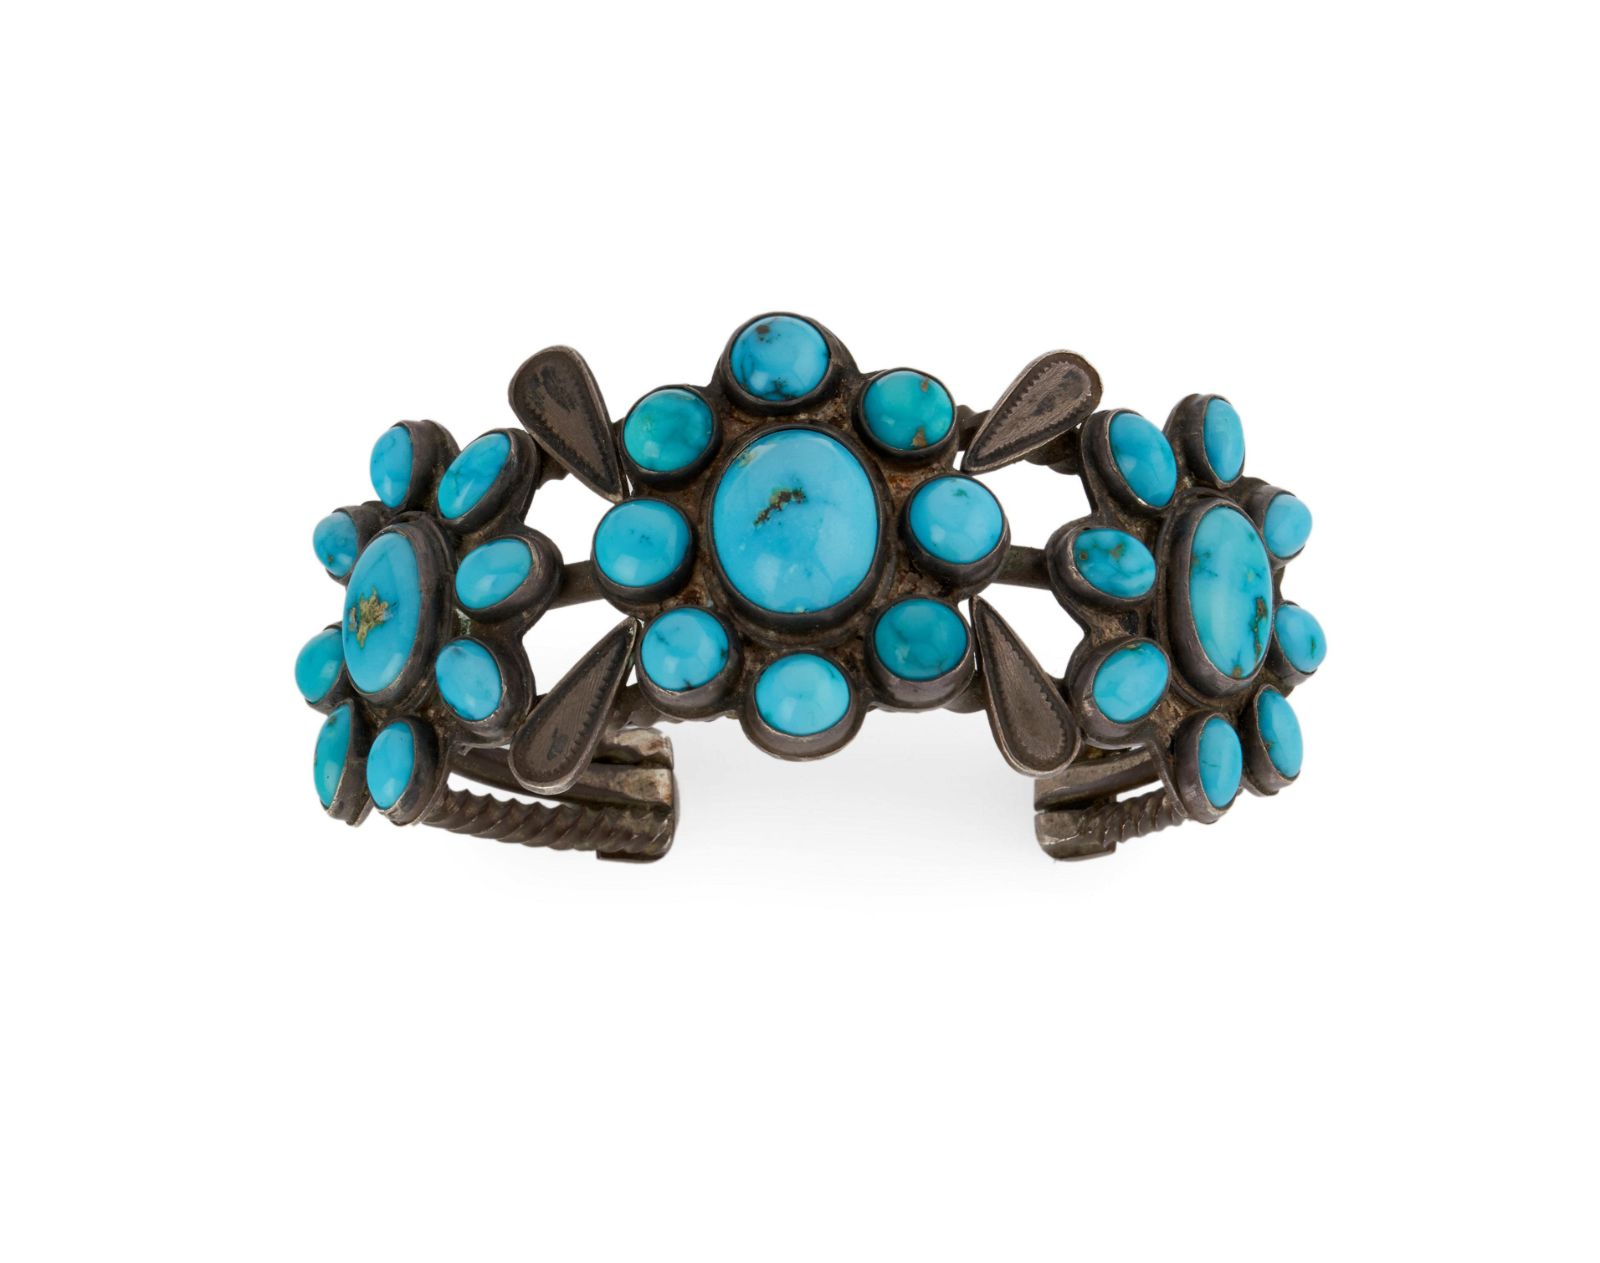 An early Zuni cluster-style bracelet